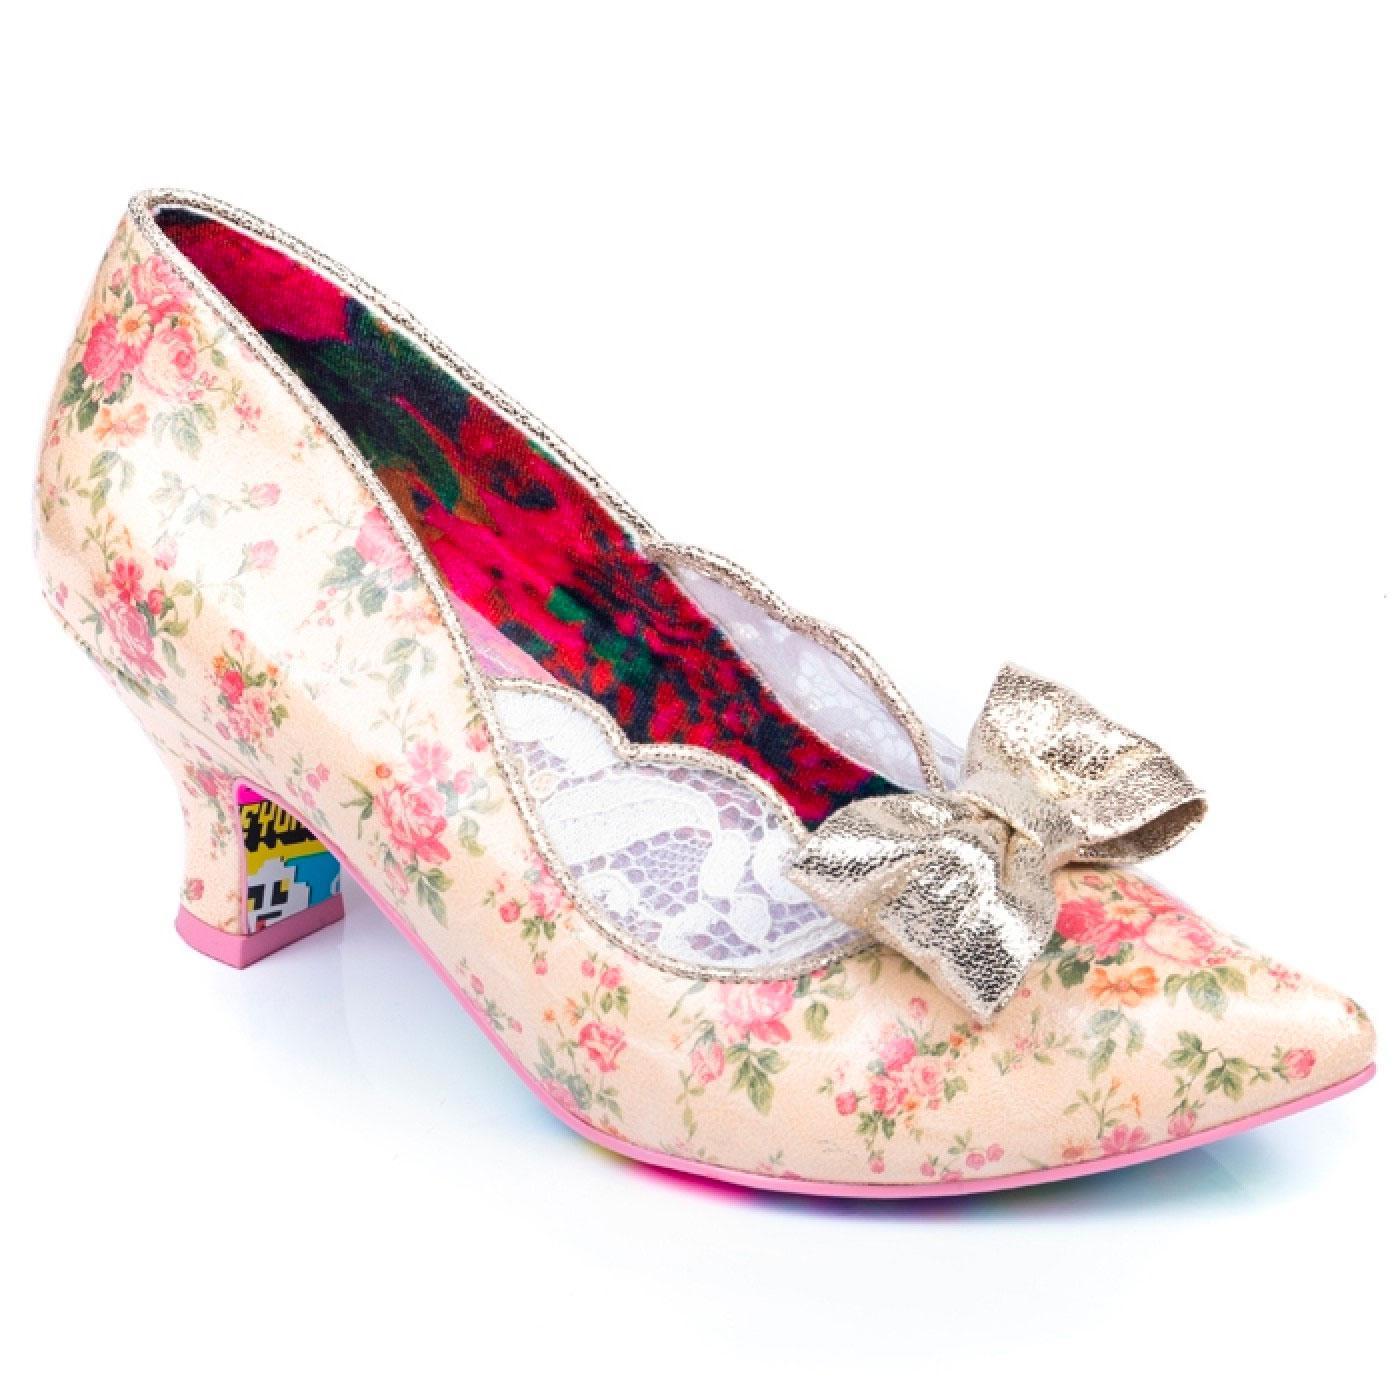 Marma Ladies IRREGULAR CHOICE Vintage Floral Heels